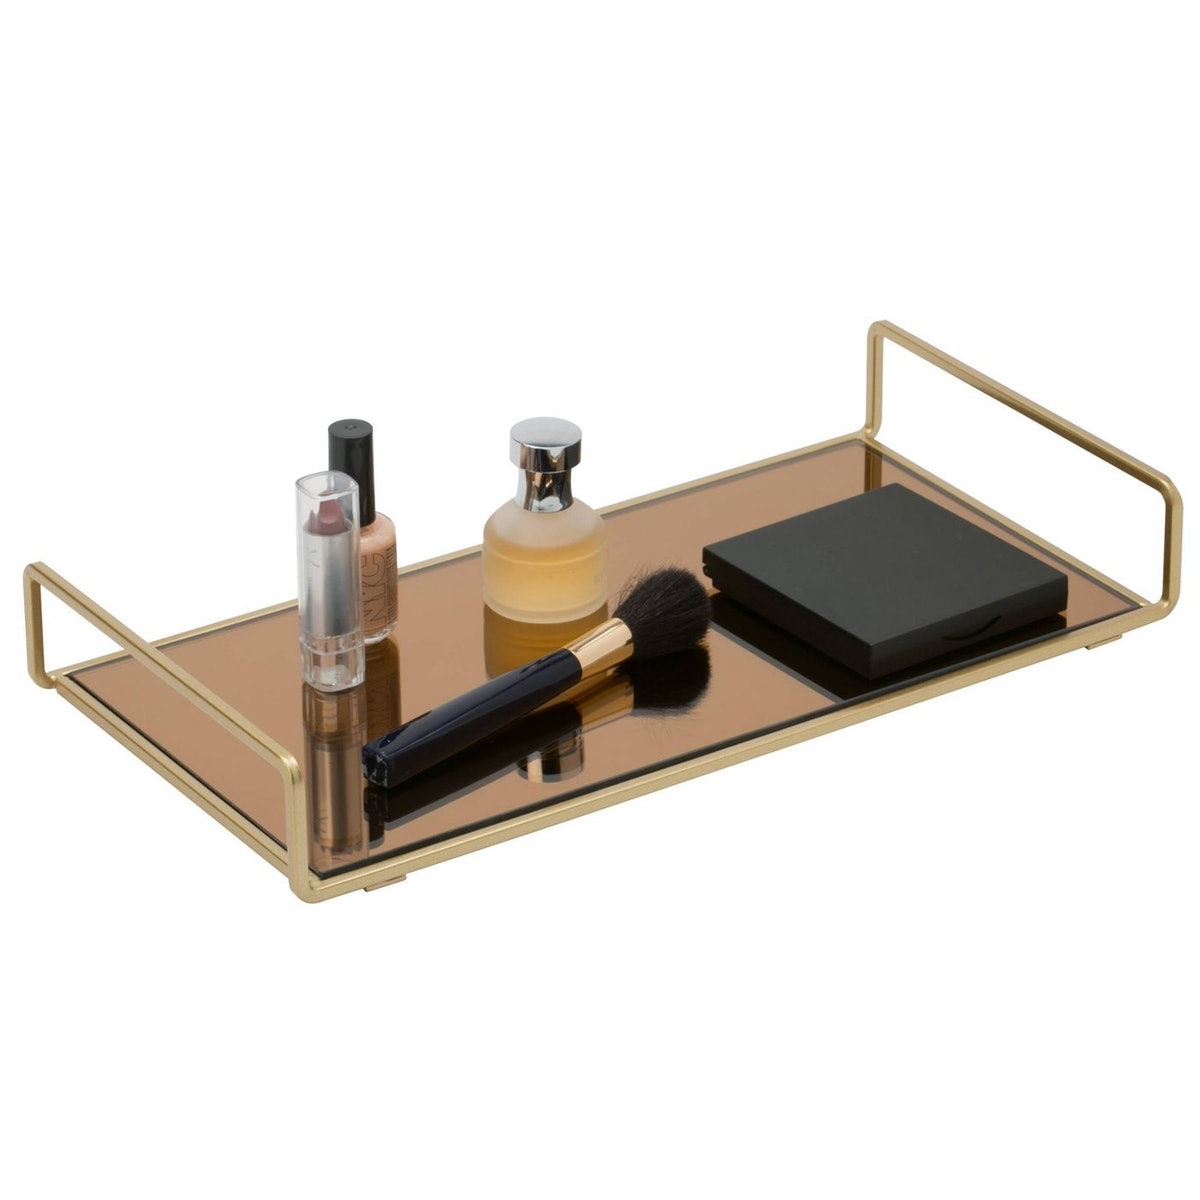 Bathroom Tray in Gold